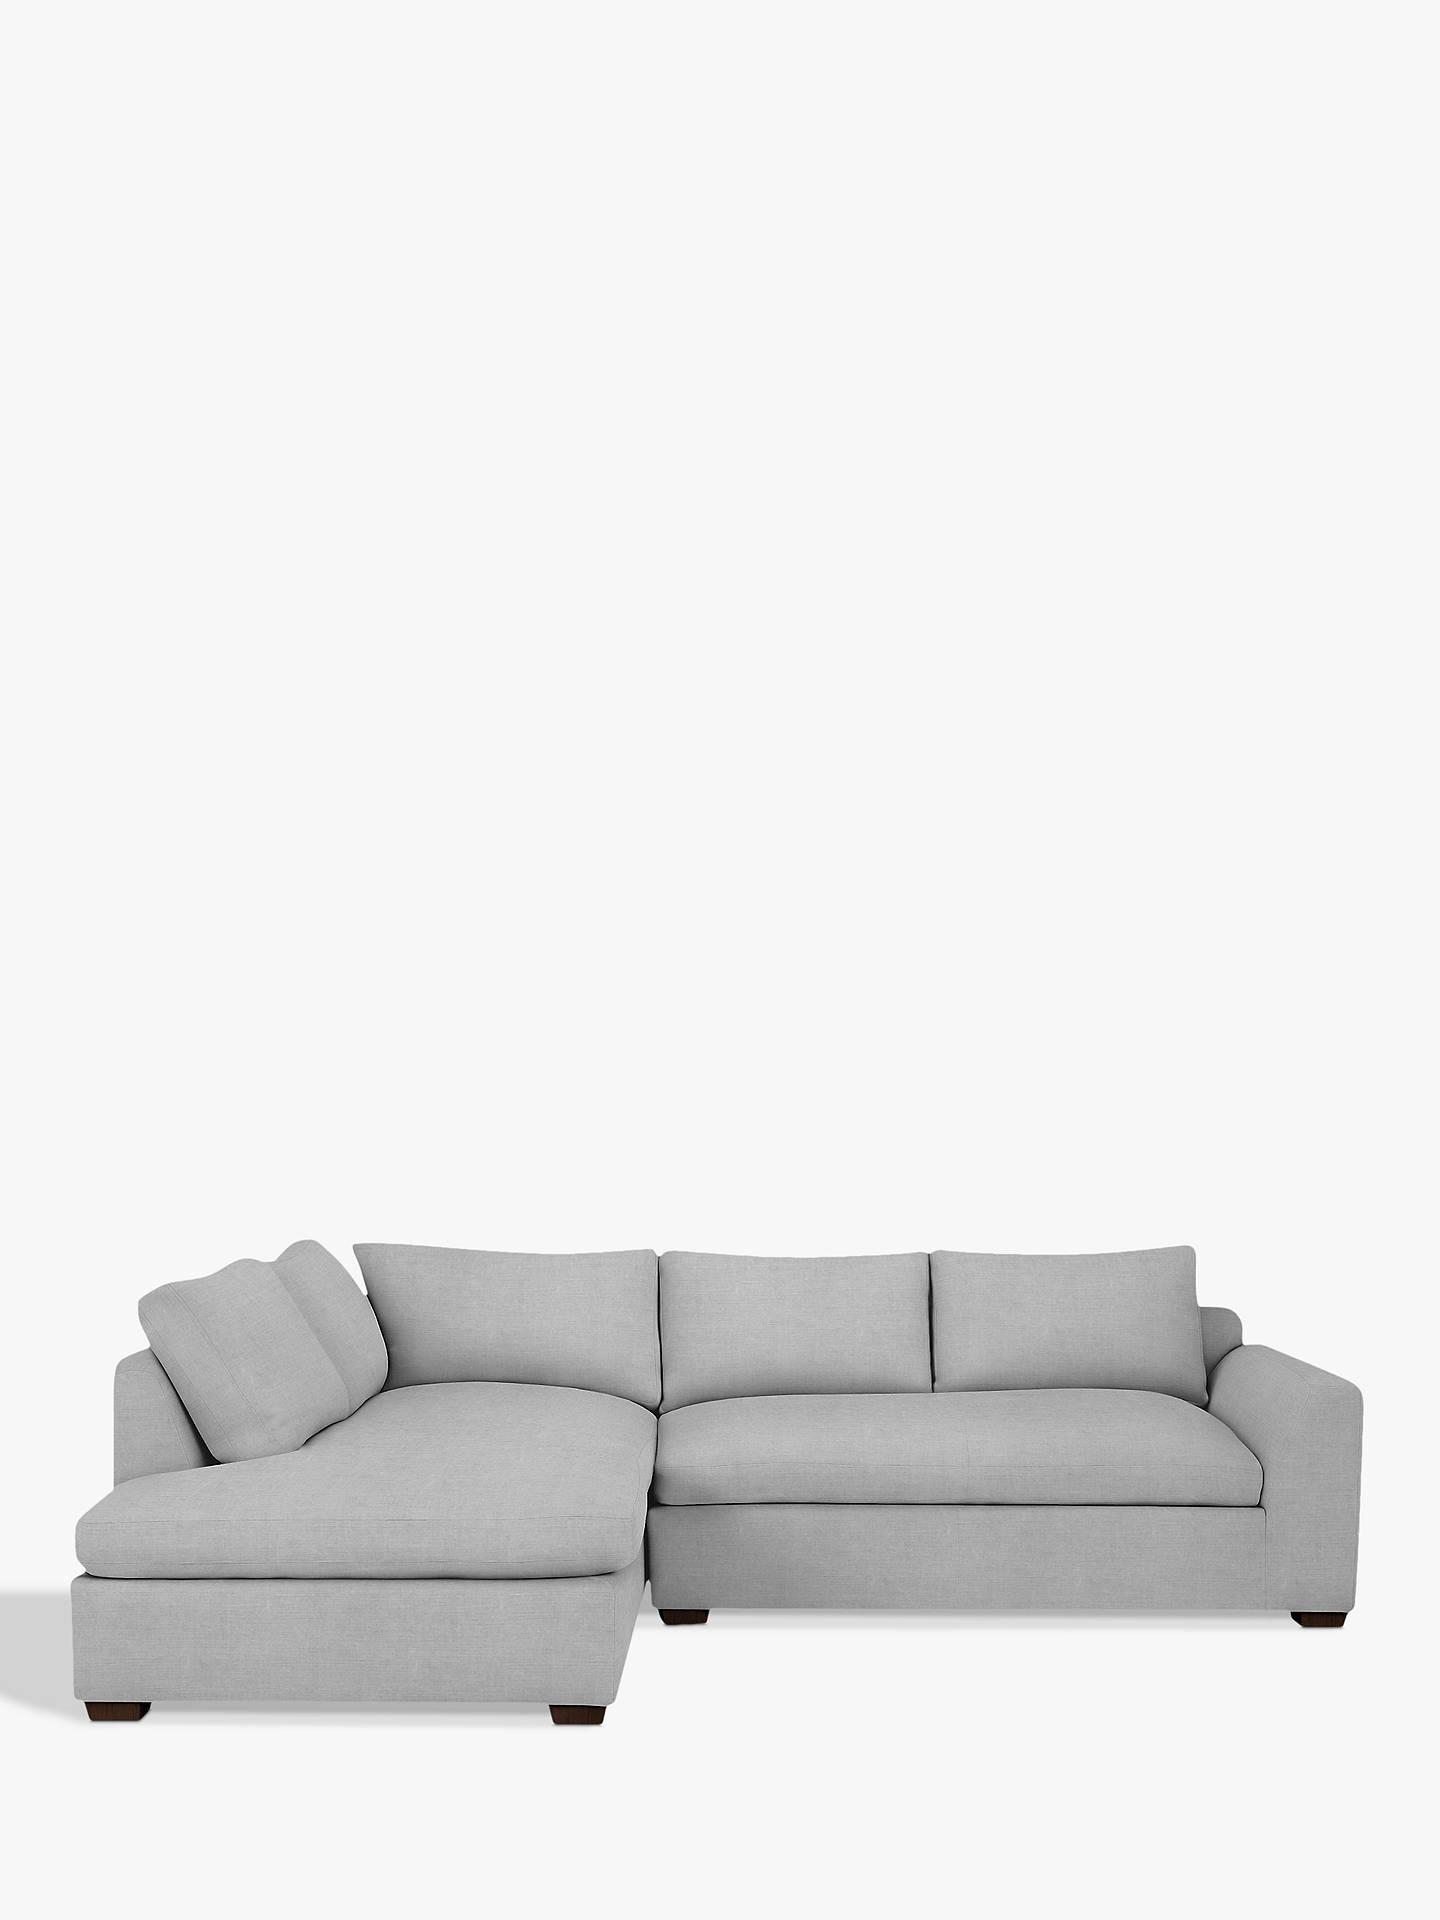 Incredible John Lewis Partners Tortona Lhf Chaise End Sofa Ncnpc Chair Design For Home Ncnpcorg